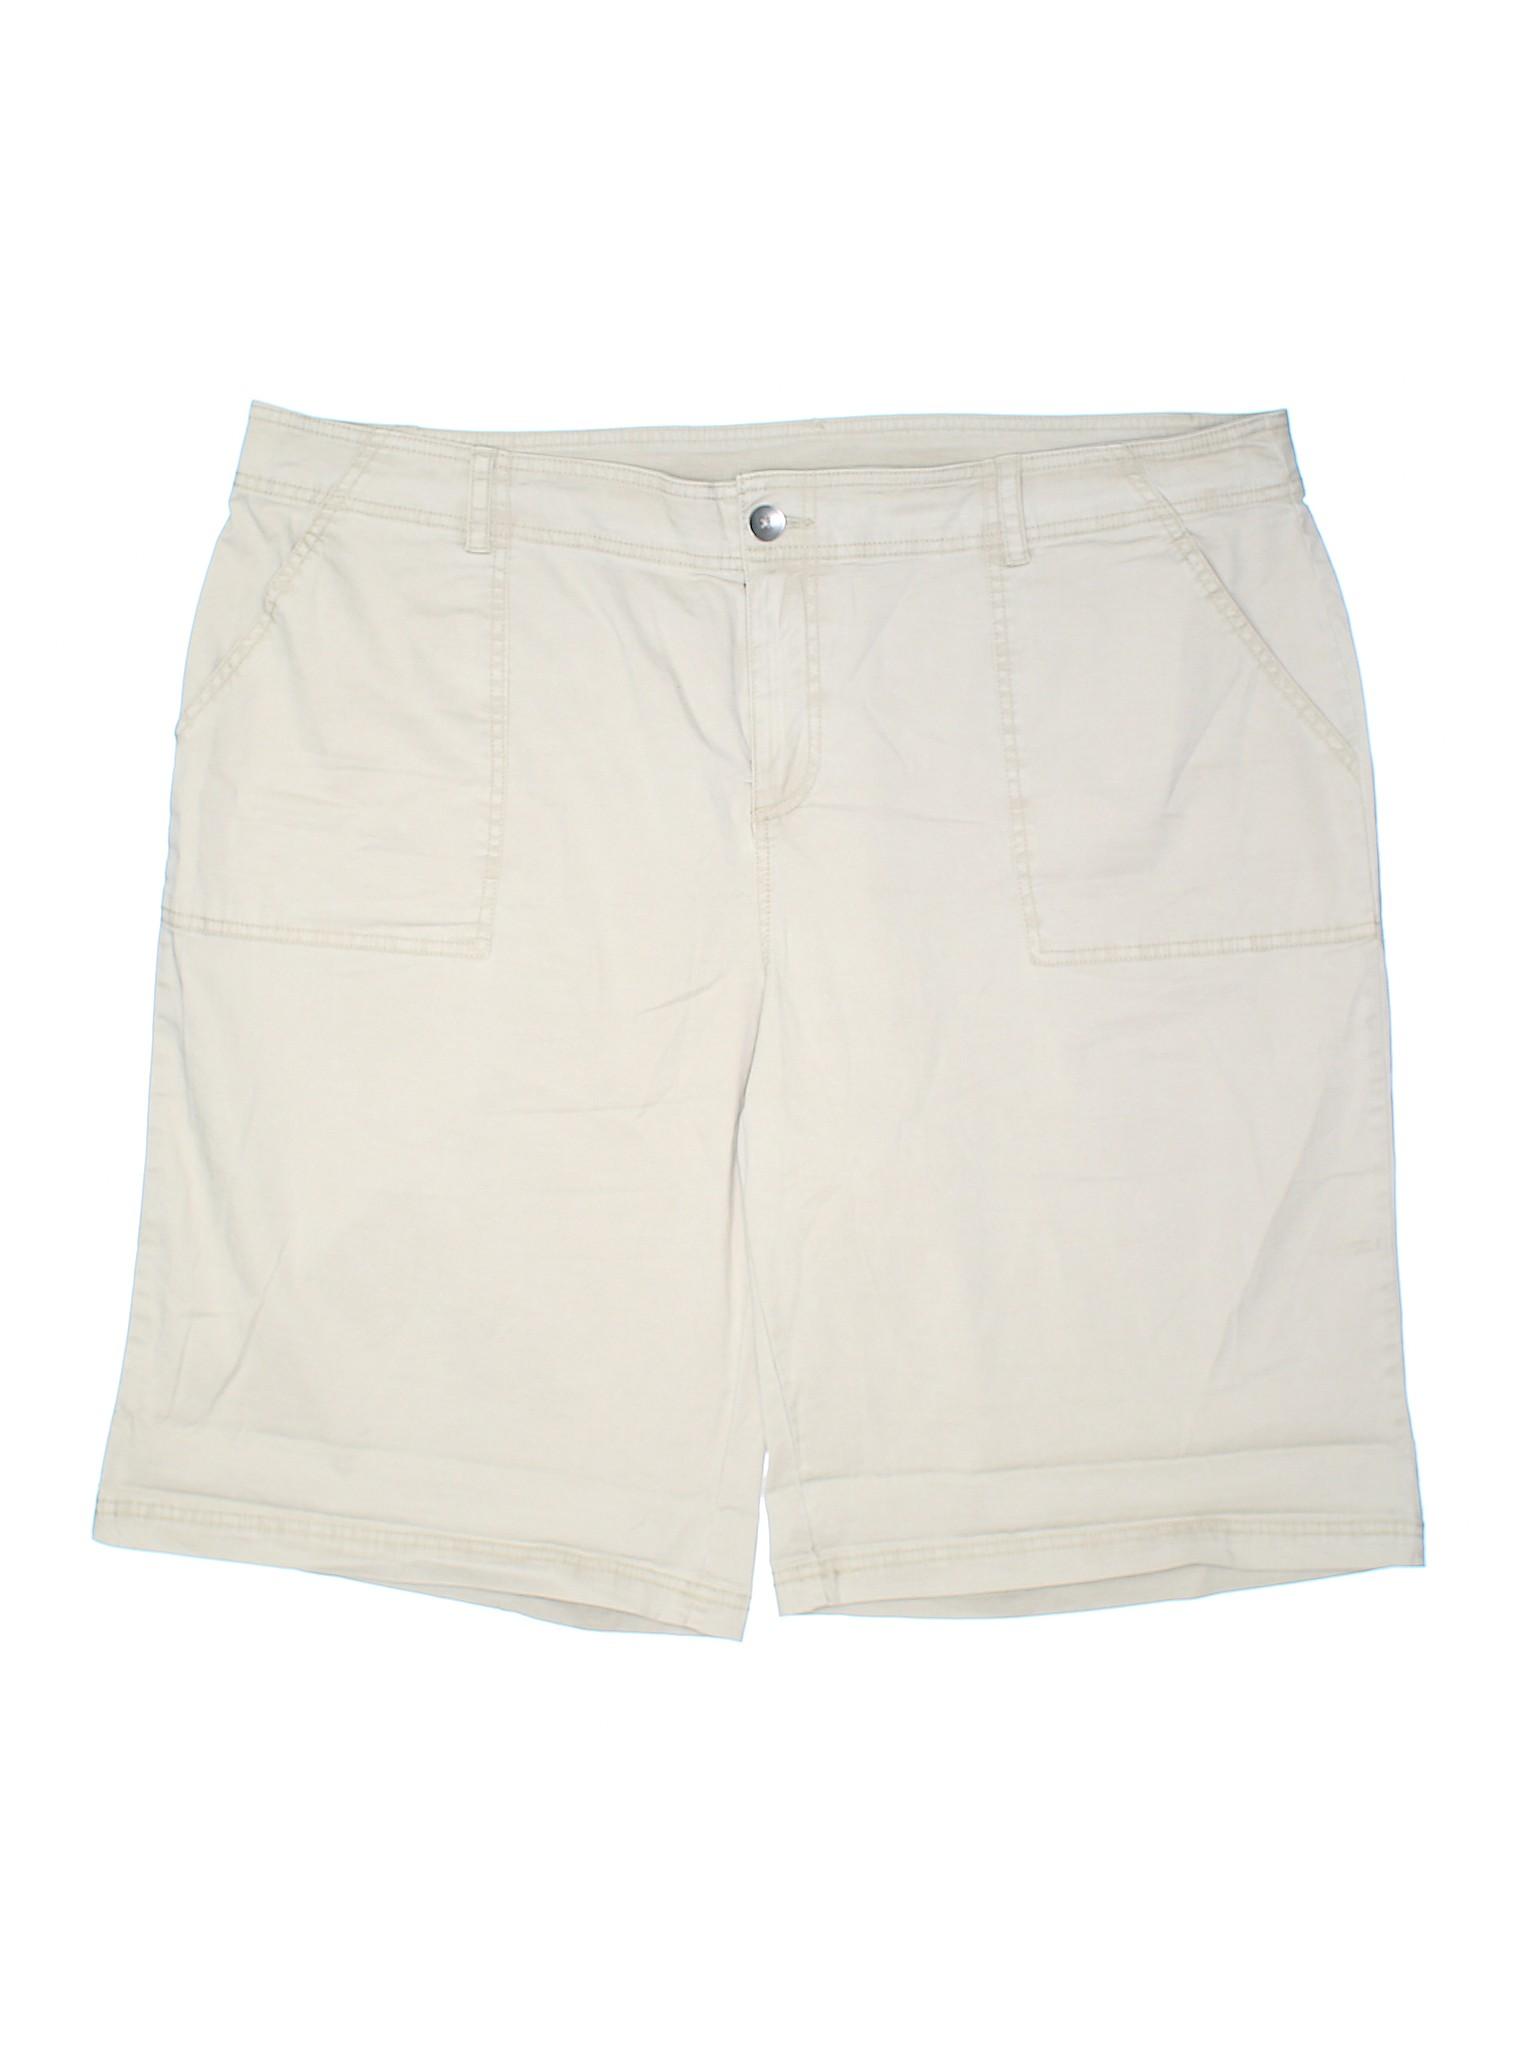 Shorts Boutique Shorts Boutique Lane Lane Boutique Bryant Khaki Khaki Bryant Lane rwPqRZvnFW